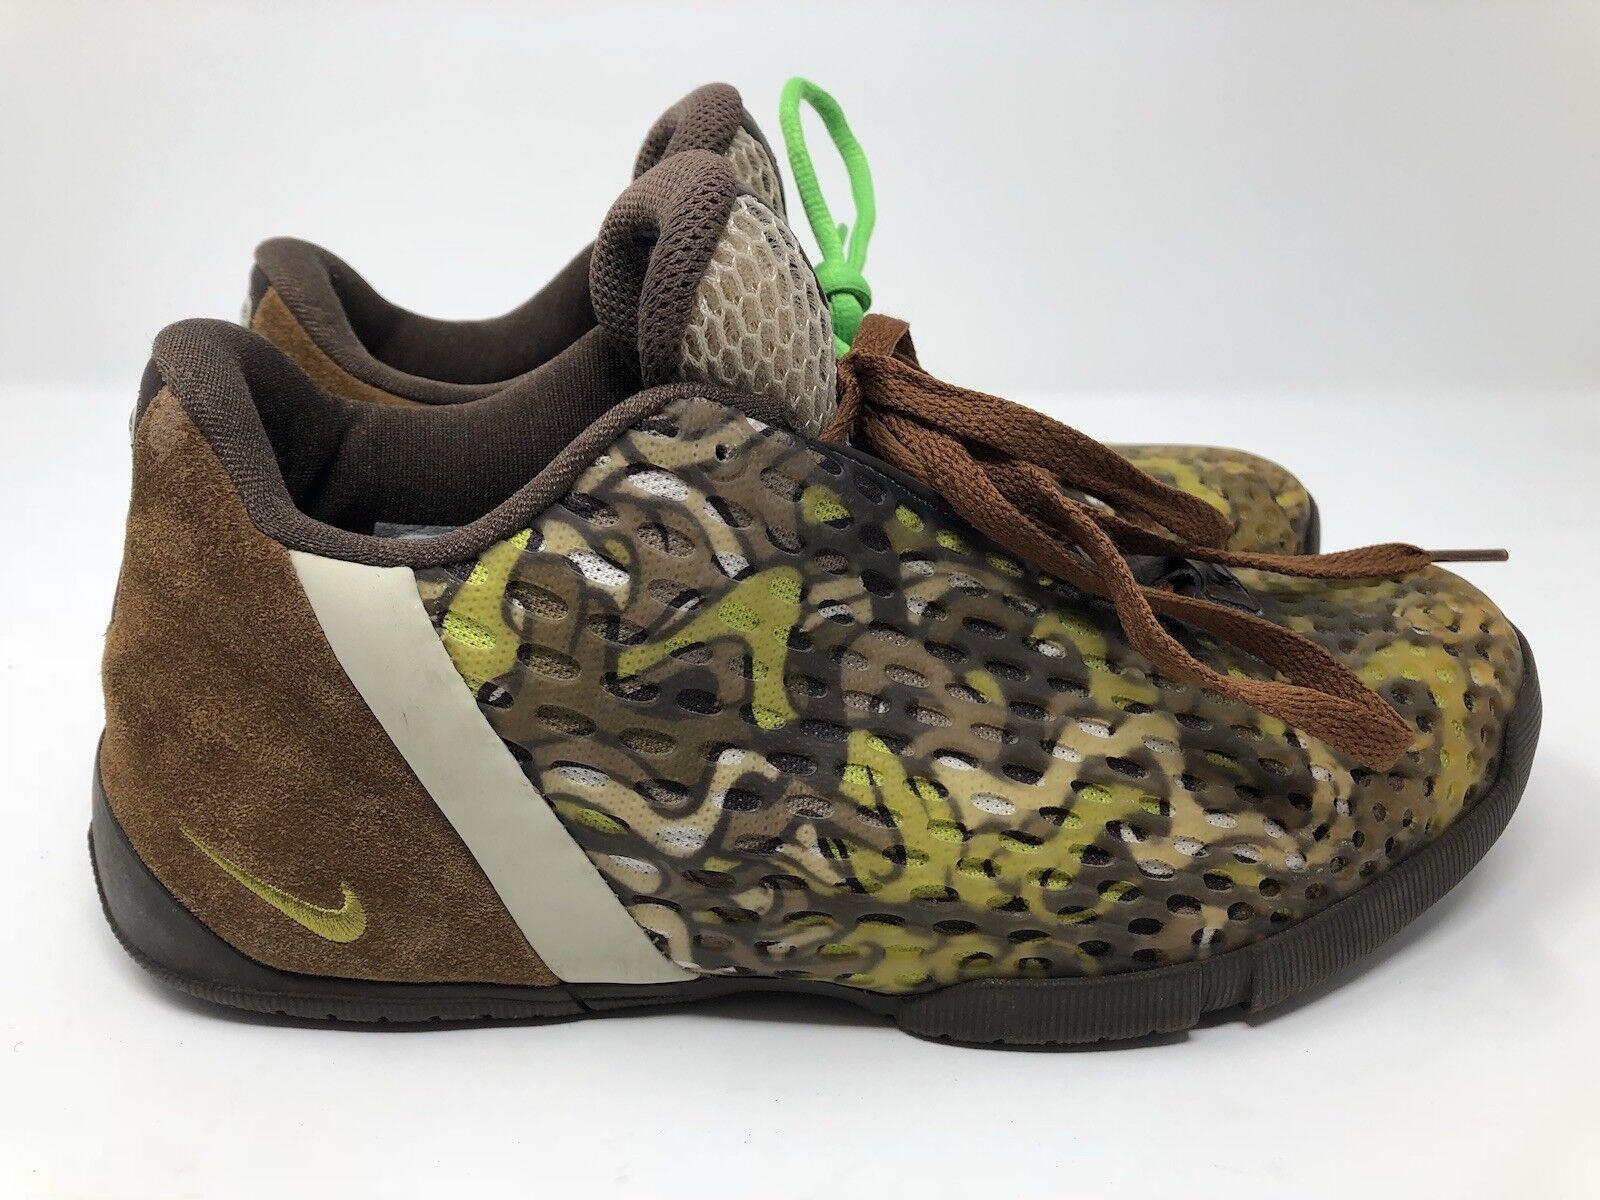 c5ff251f23fe7 Nike Mens Vintage zm2 Brown Brown Brown Green Camo Size 9.5 US 8.5 UK 7ff708